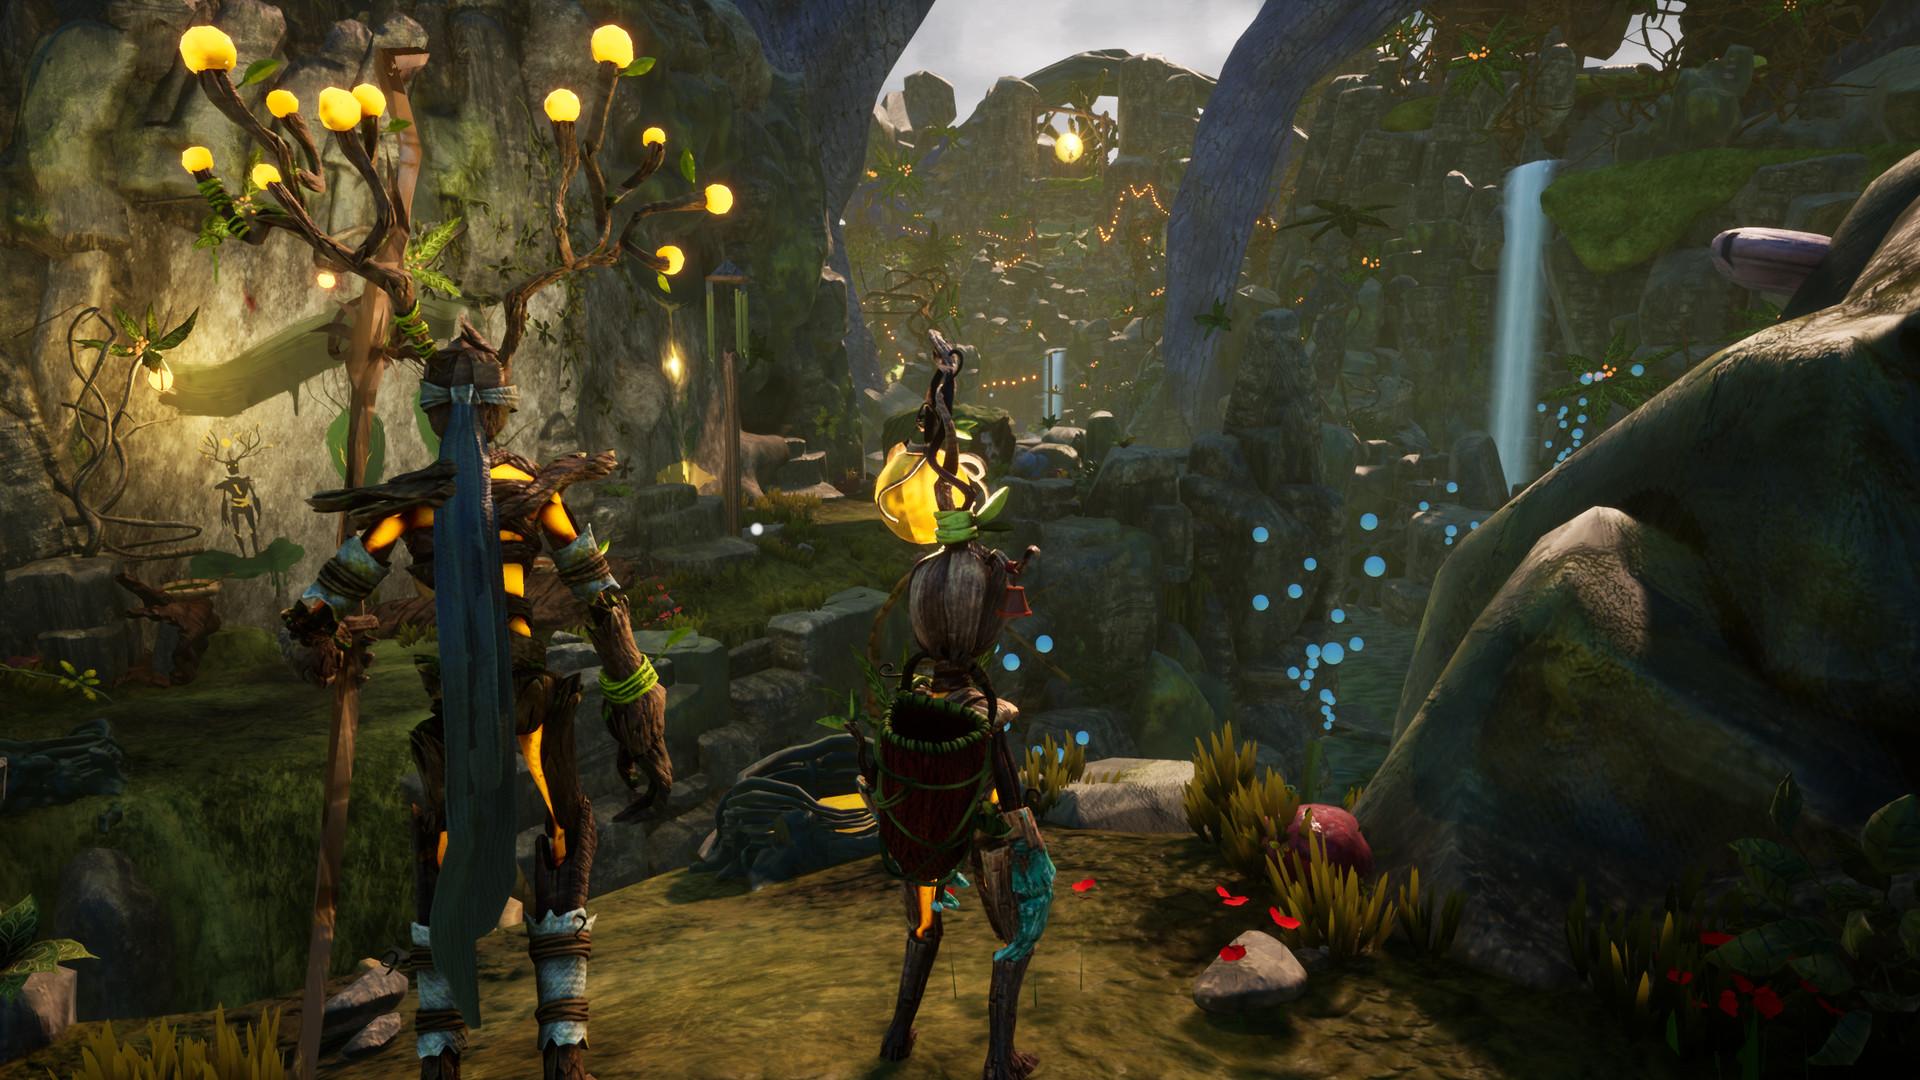 Weakless вышла на PC adventures,pc,weakless,анонсы,Игры,Приключения